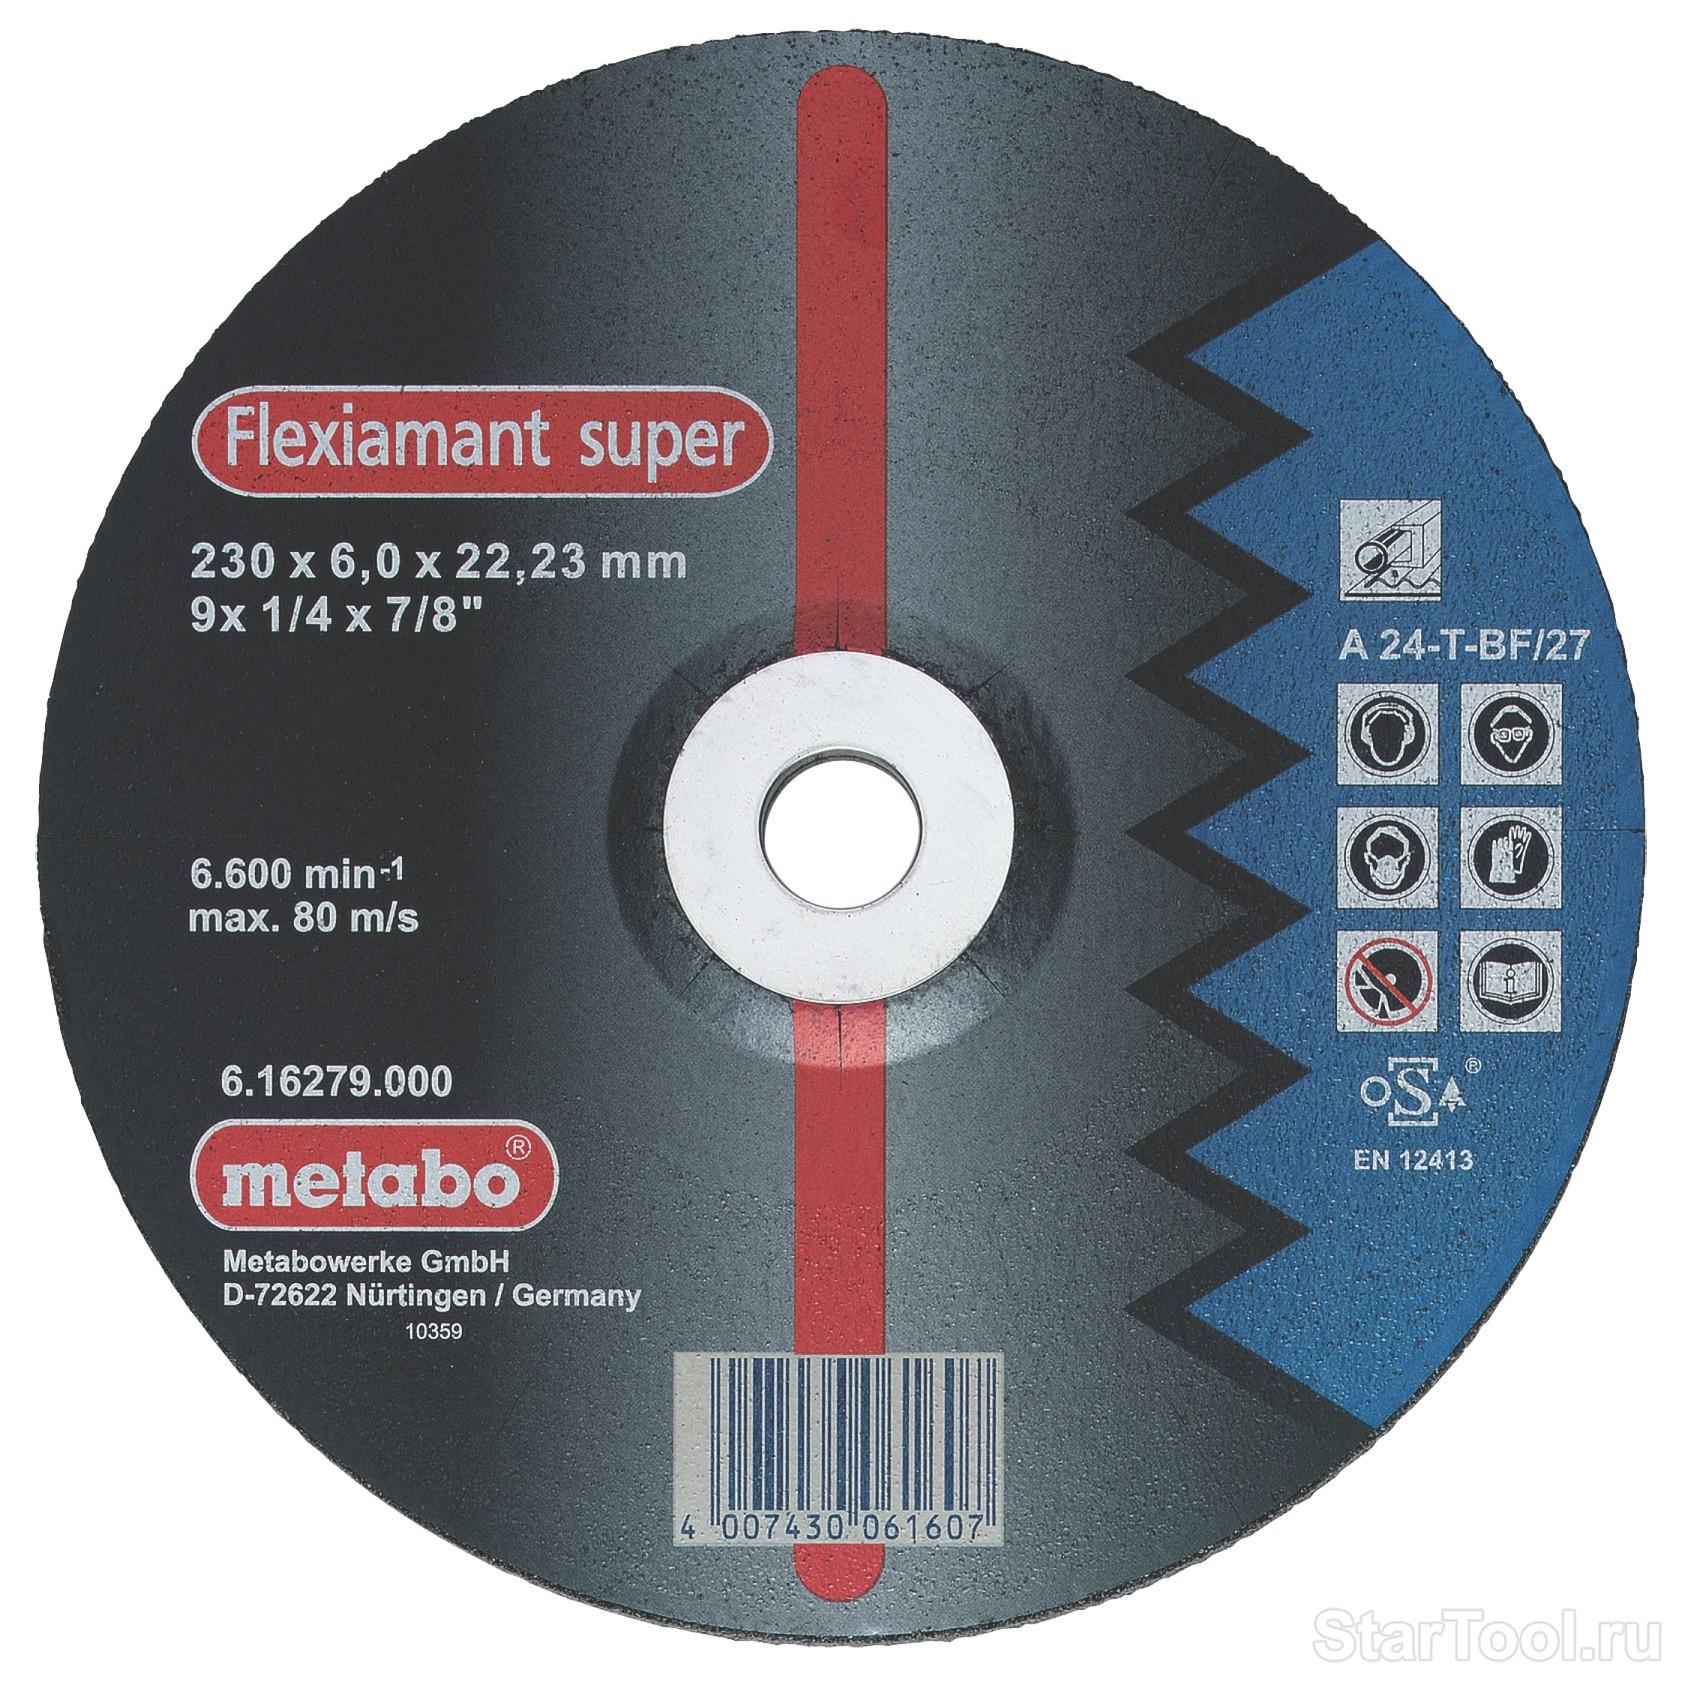 Круг шлифовальный ф180х6,0х22 по металлу Flexiamant Metabo 616277000